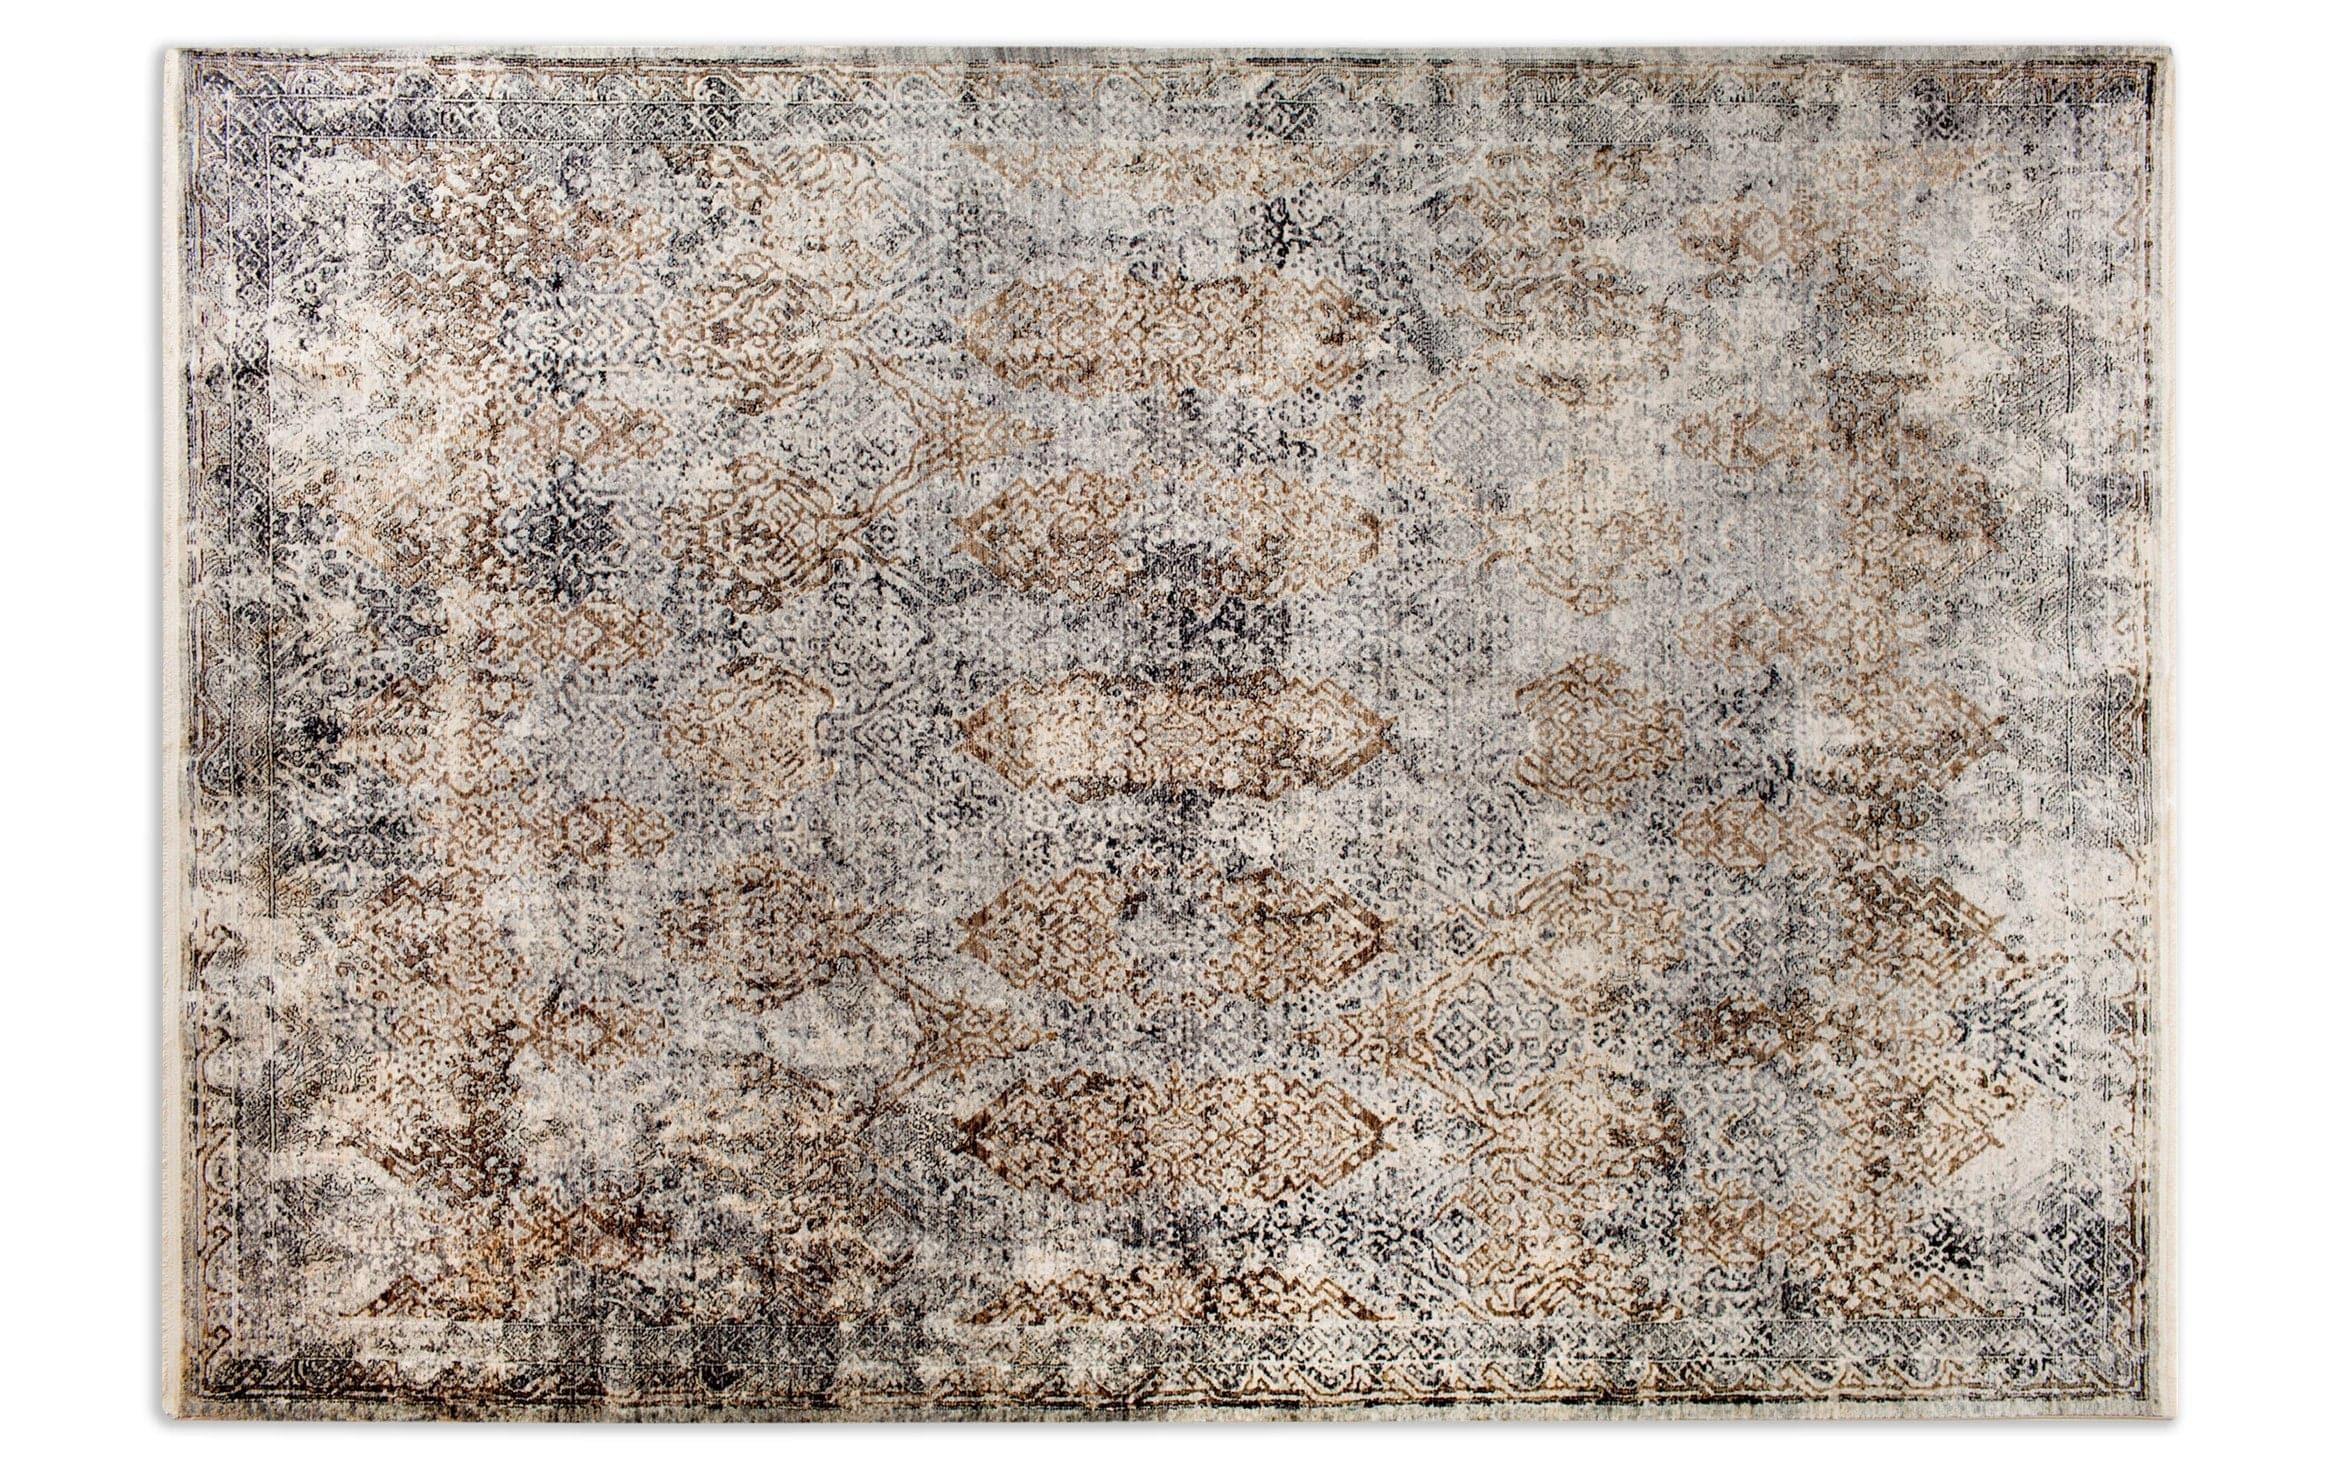 Tapestry 5 3 X 7 10 Rug Bobs Com